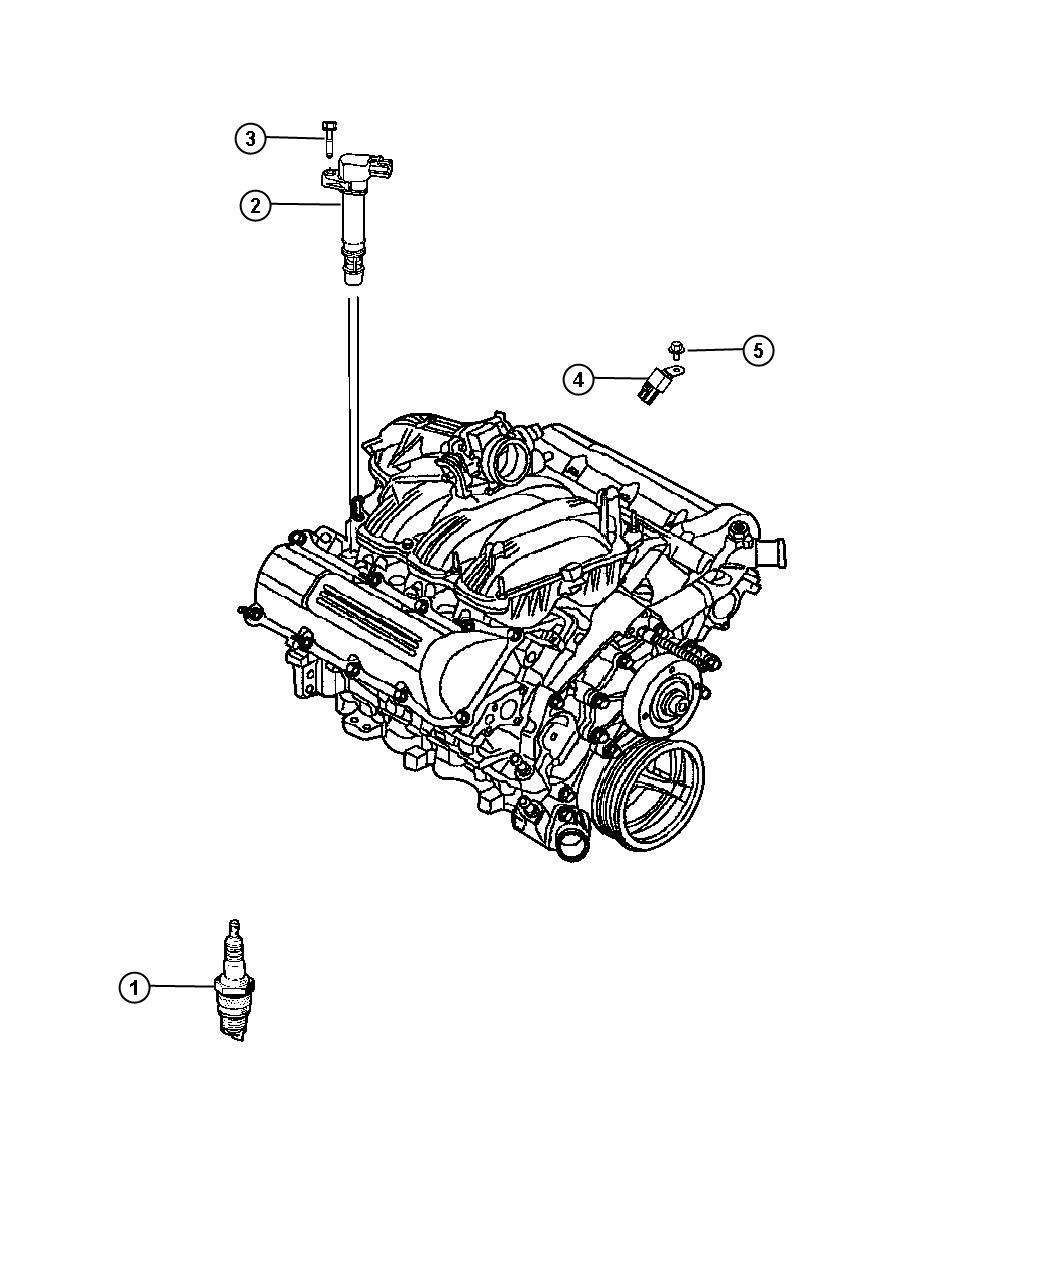 i2276711  Hemi Mds Vvt Engine Diagram on